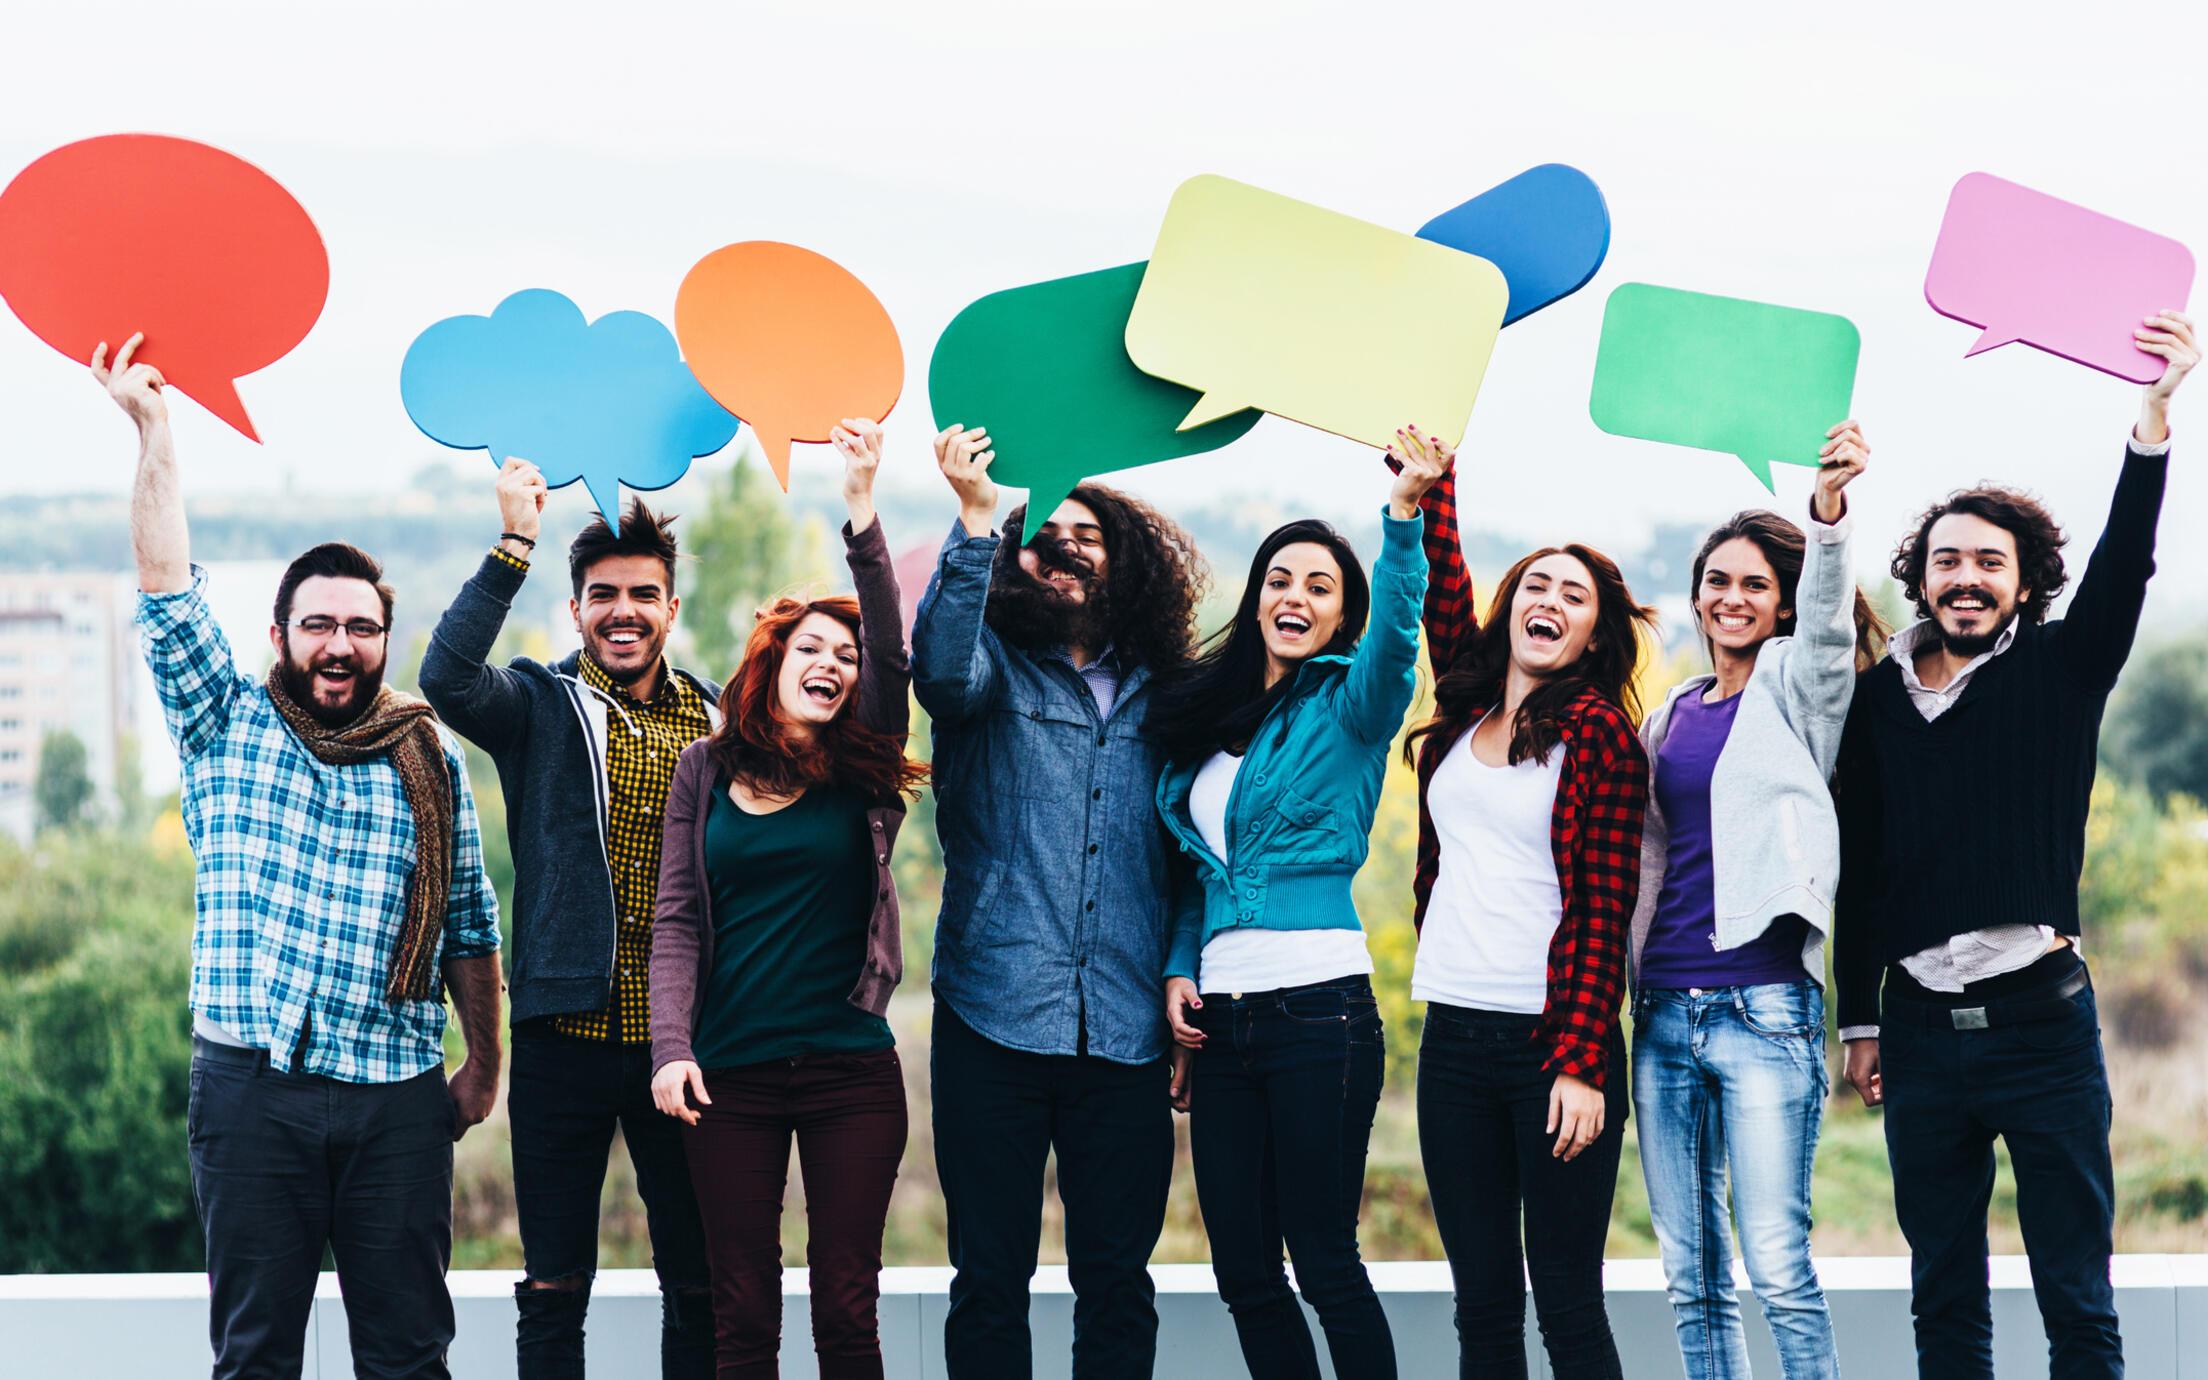 People holding speech bubbles